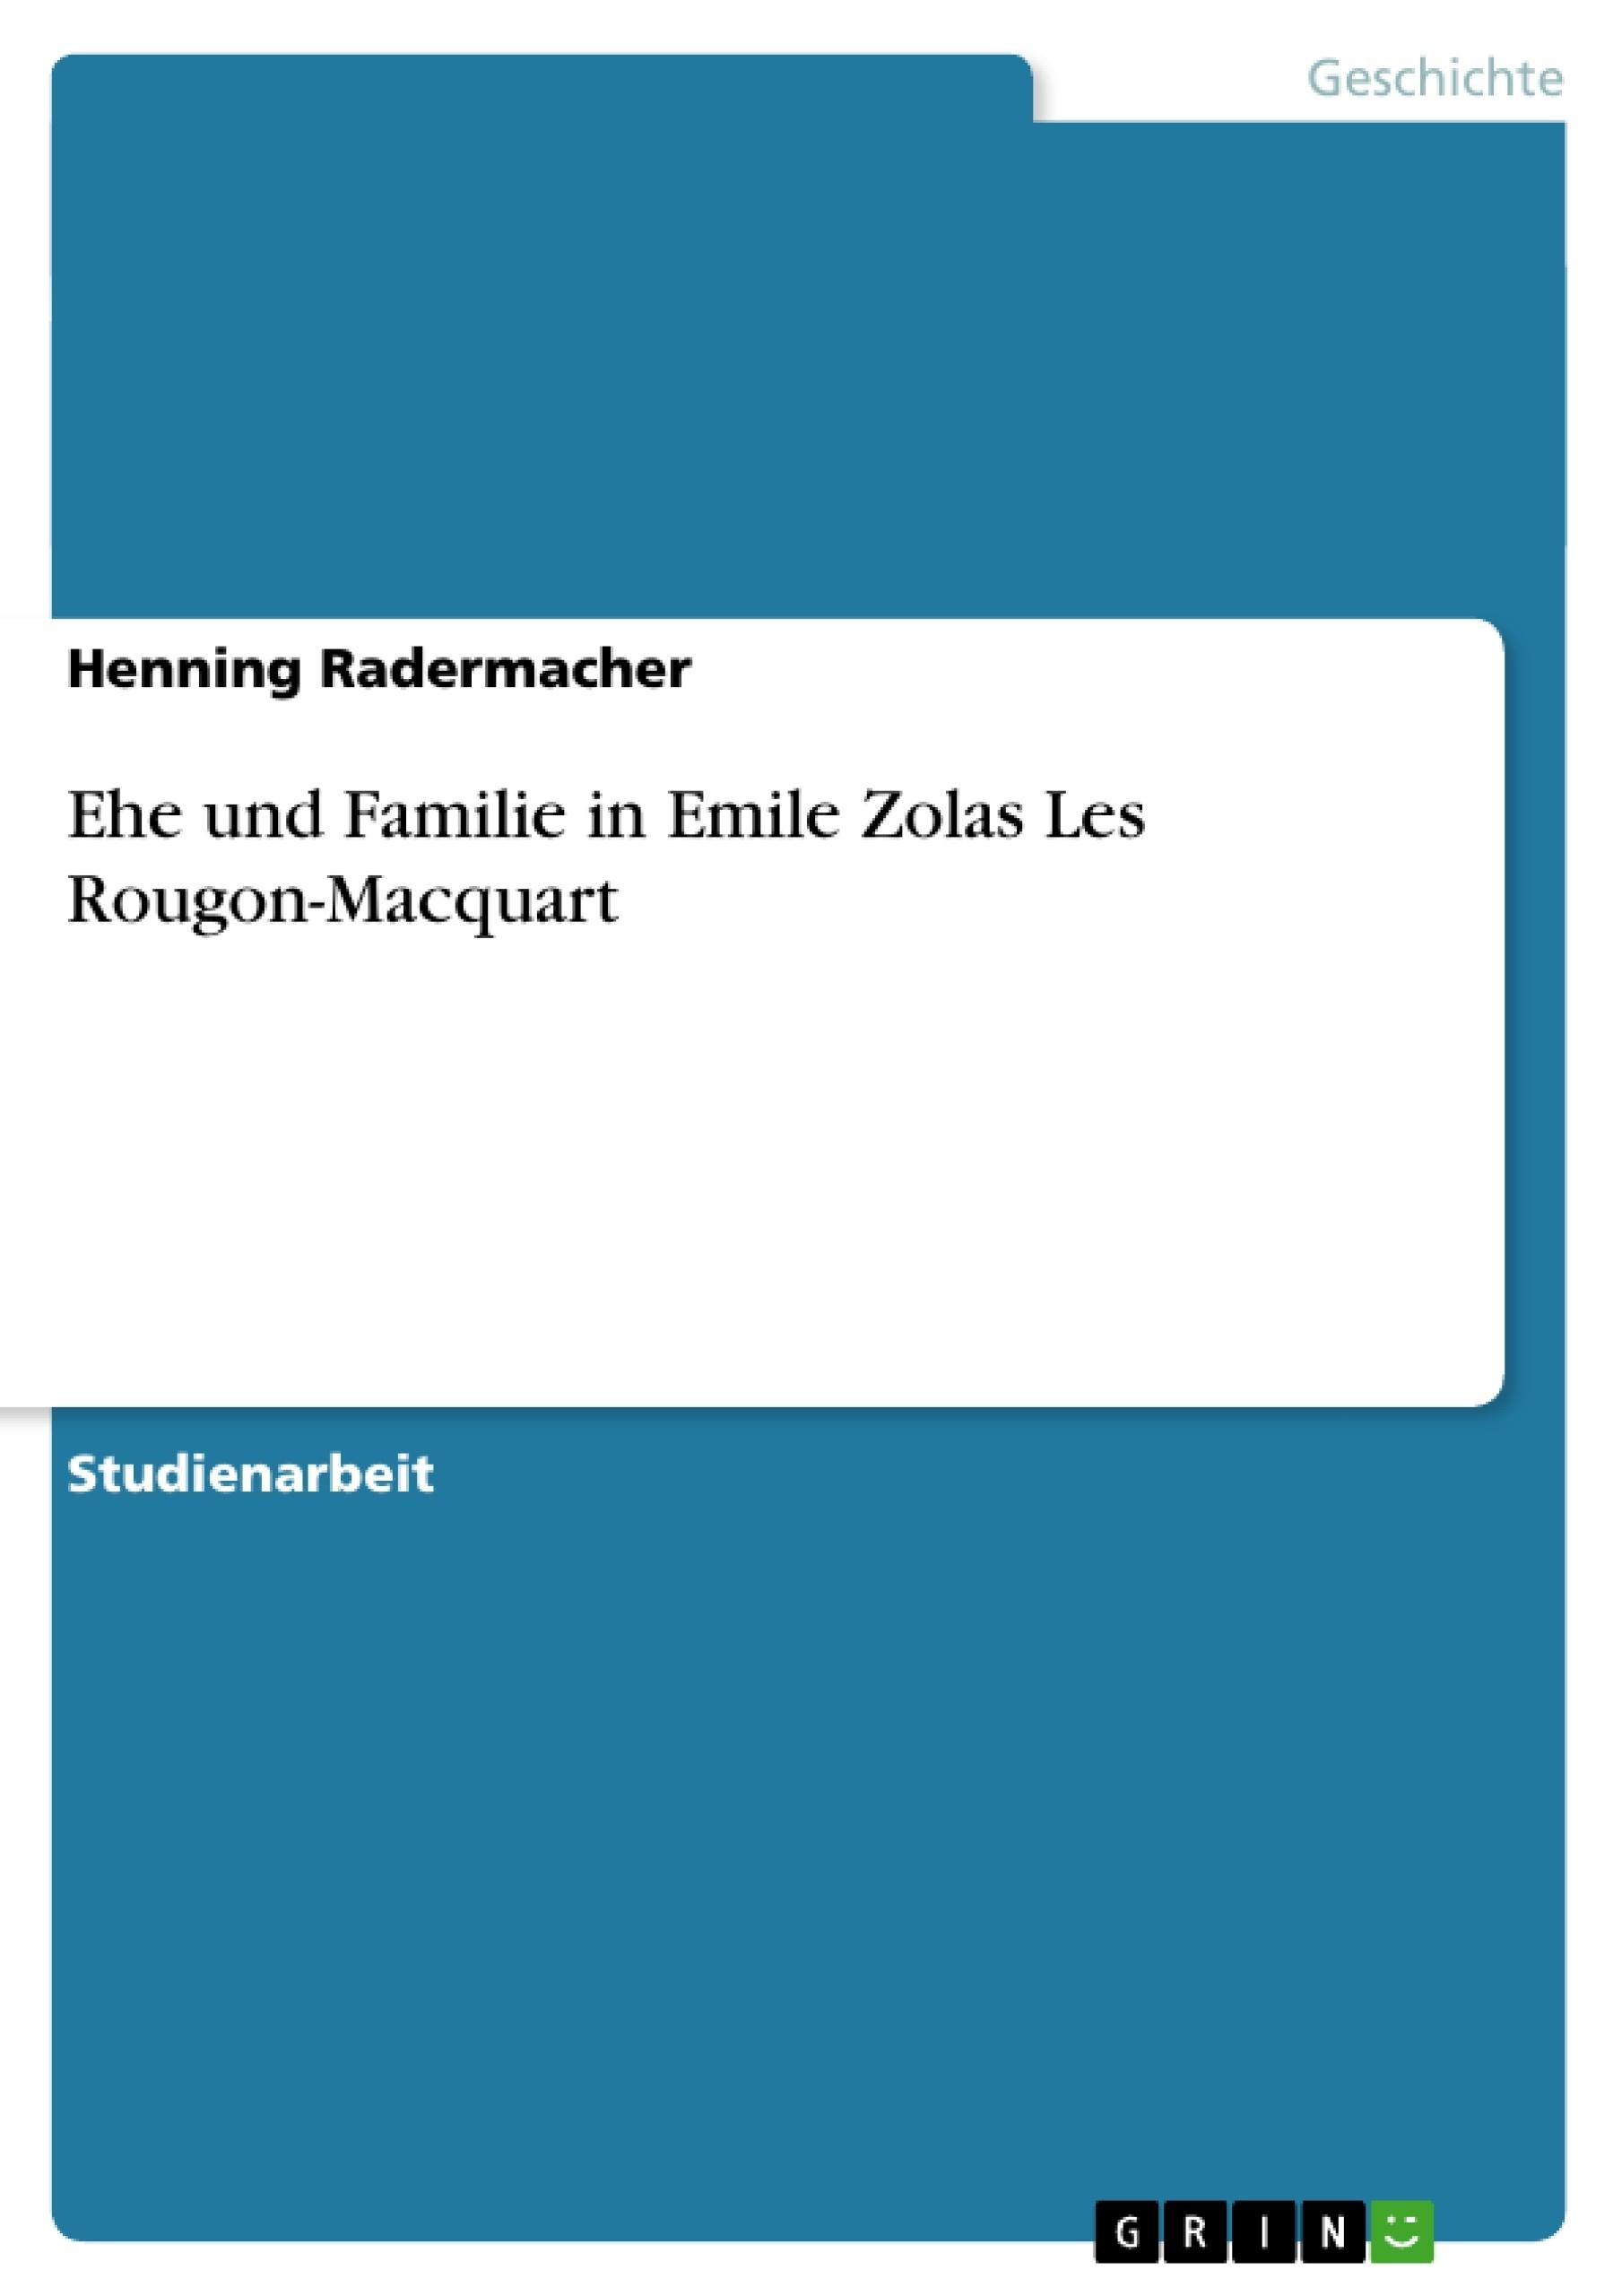 Titel: Ehe und Familie in Emile Zolas Les Rougon-Macquart